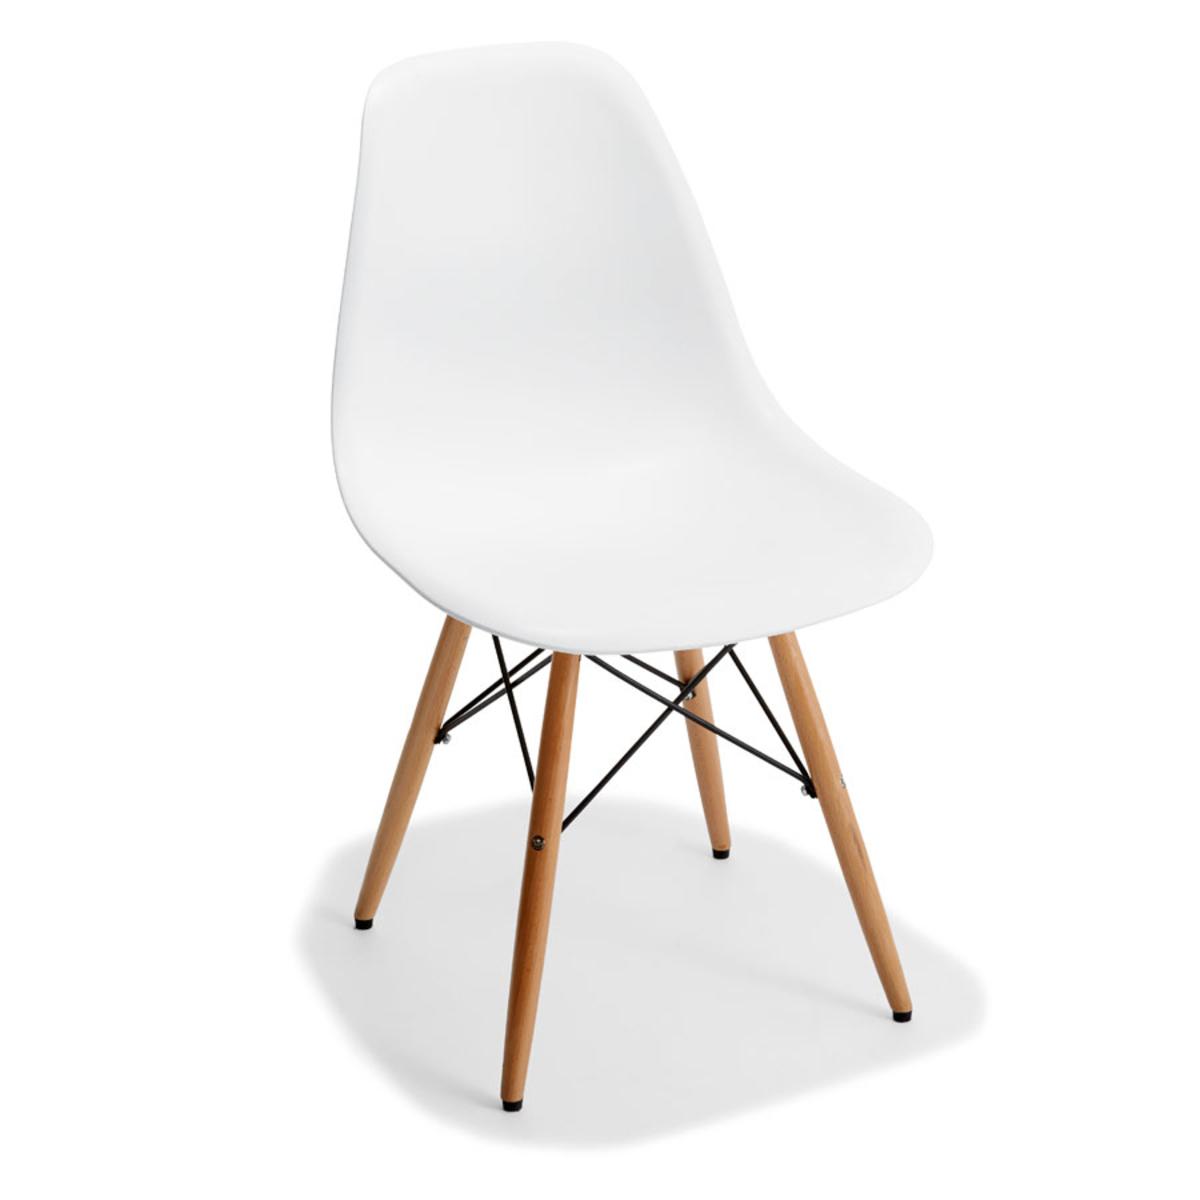 white outdoor dining chair australia htt massage kmart